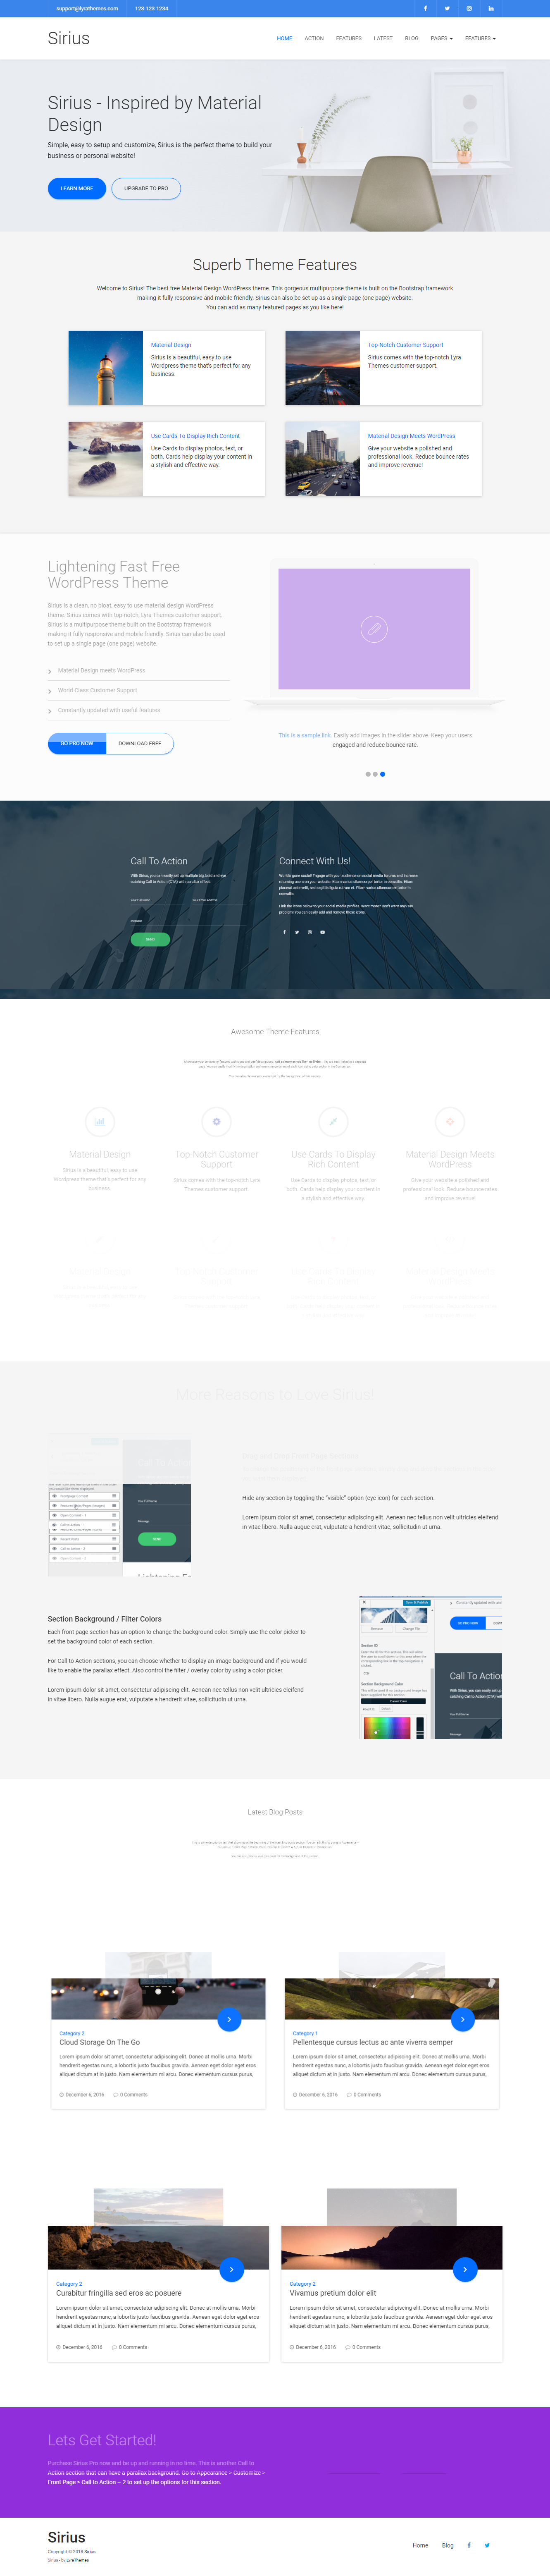 Sirius Lite - Best Free Material Design WordPress Theme